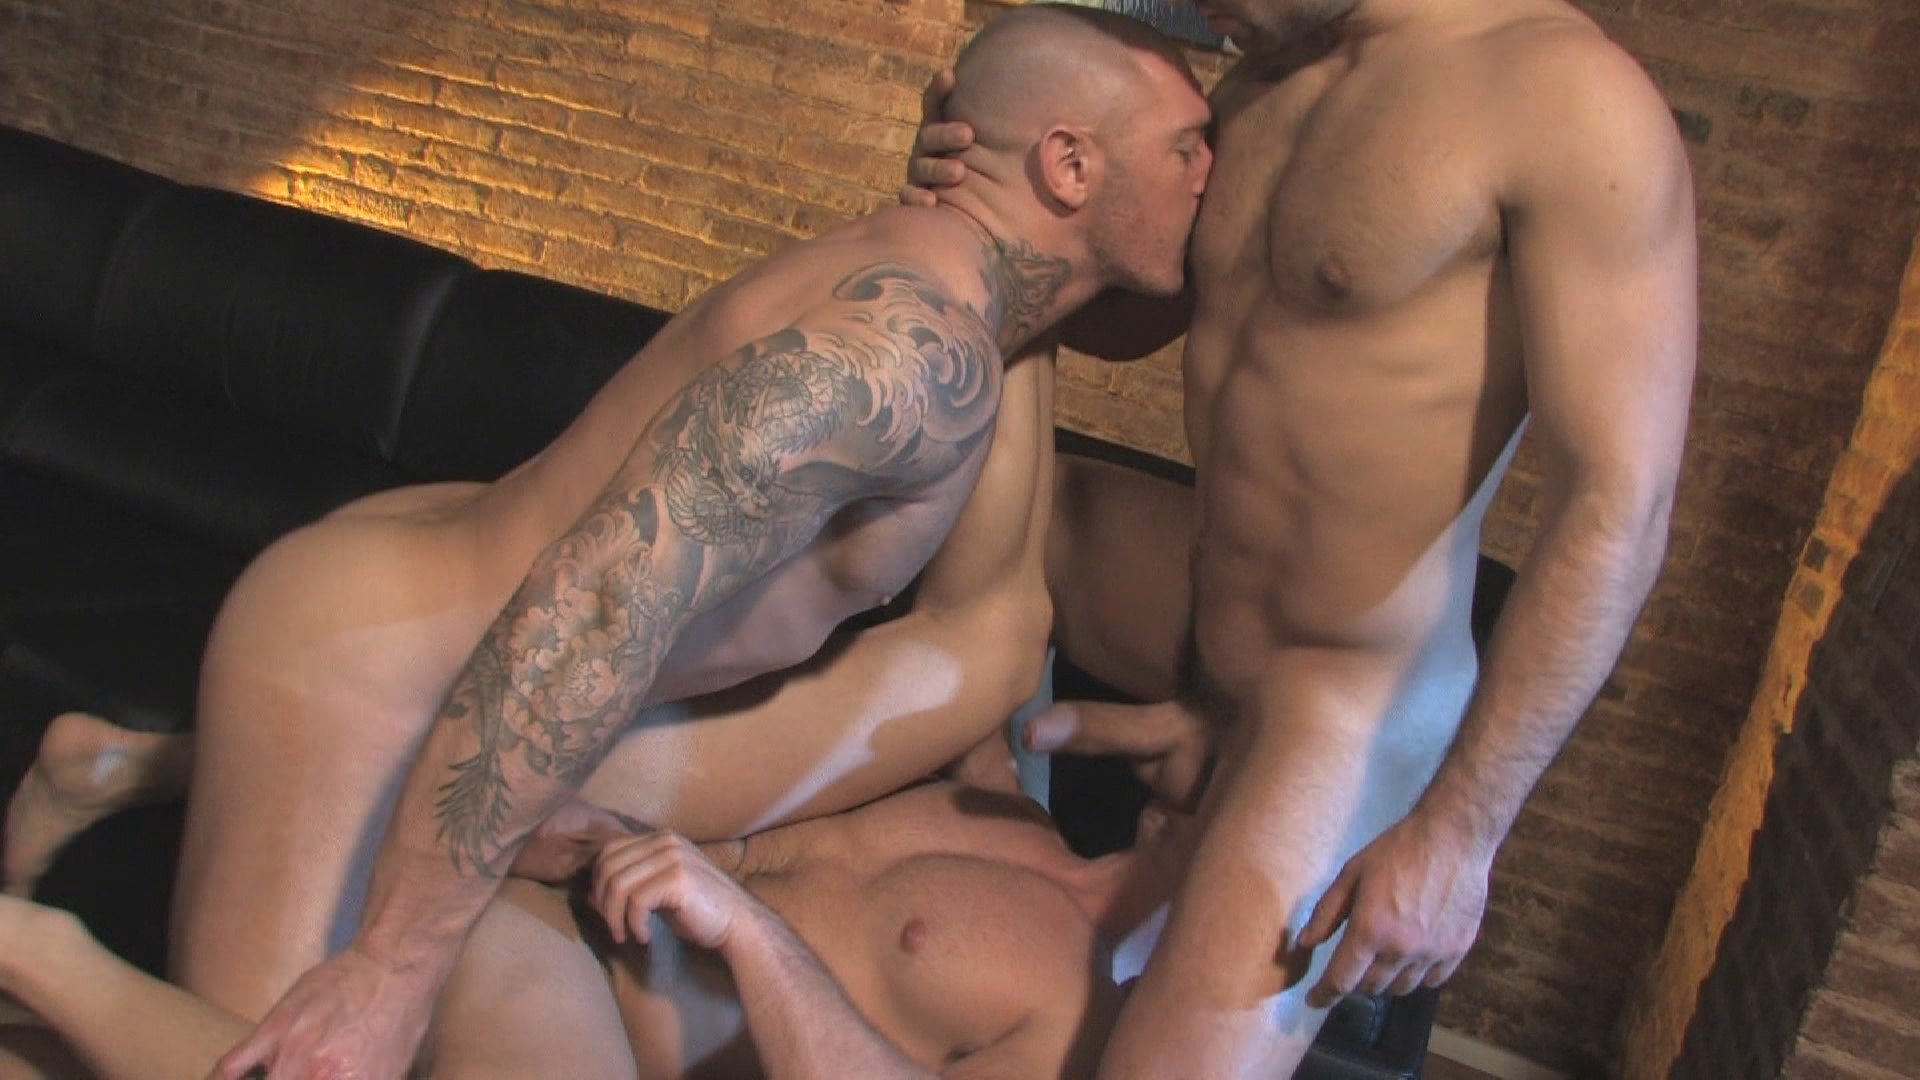 Adrian Spanish Free Gay Porn Video unlimited sexual possibilities in spain - gay - sexo en